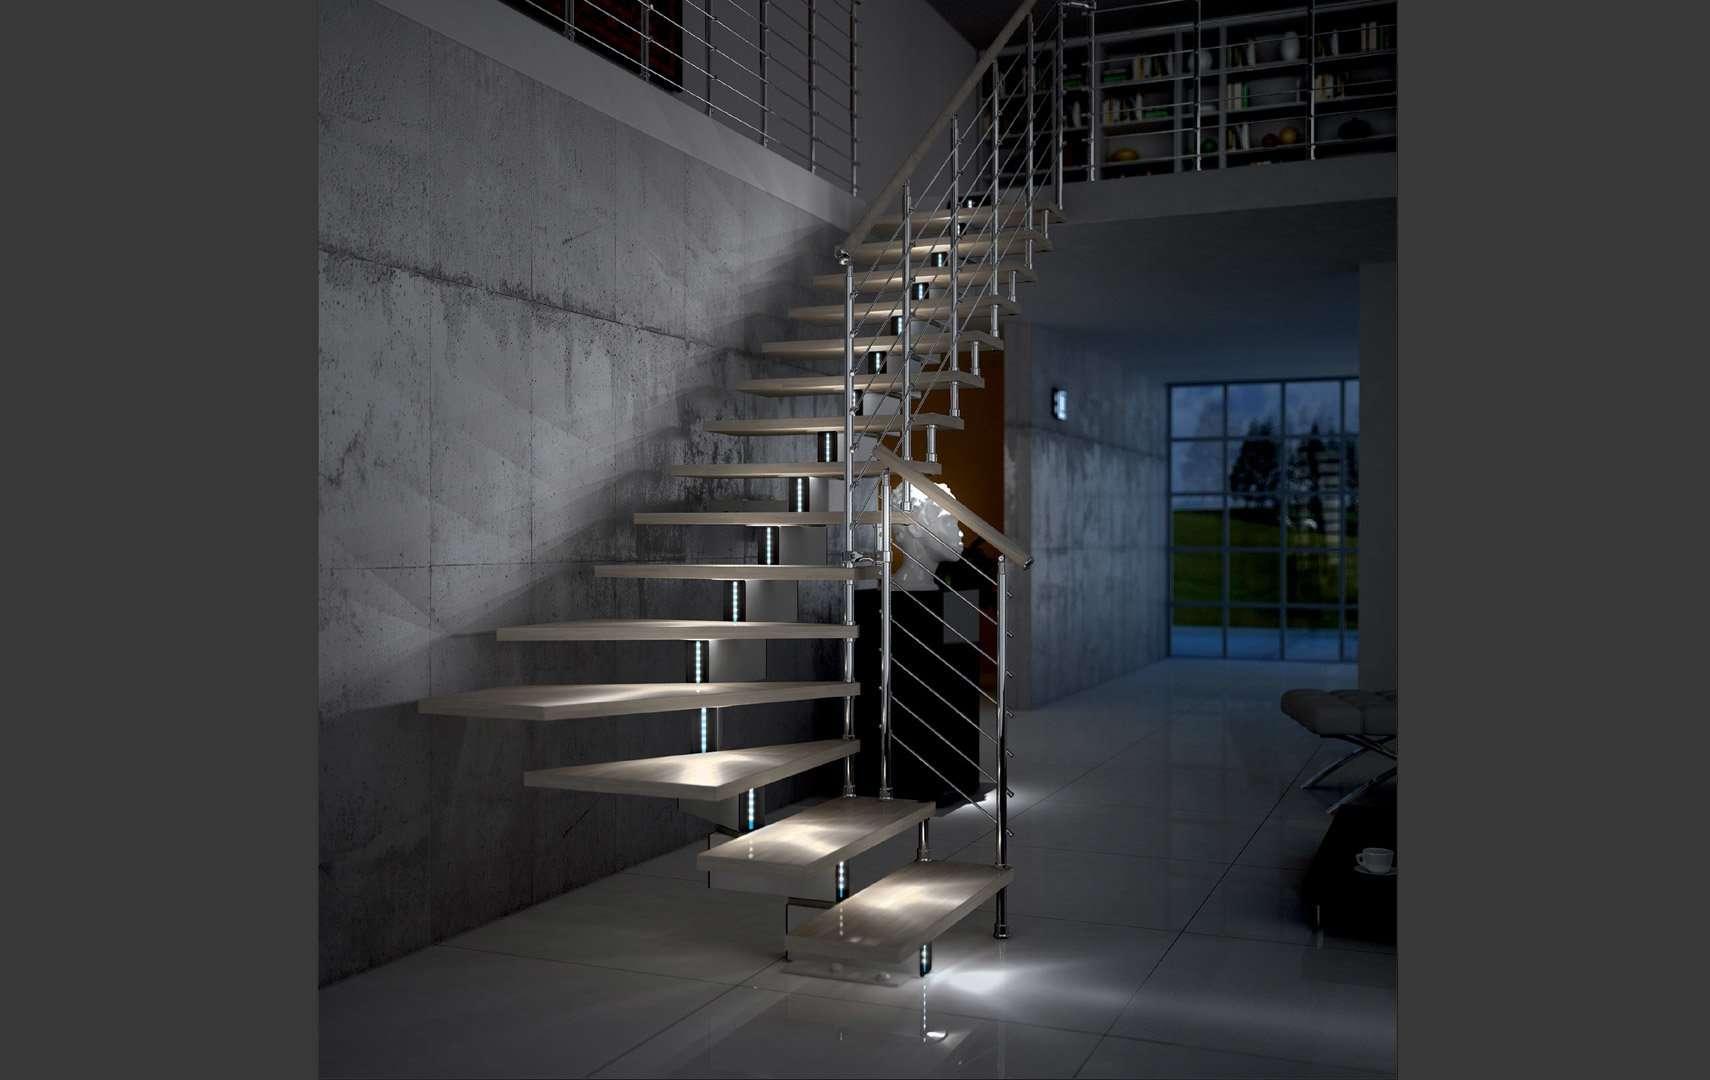 Jazz chrome led scale interne con luci a led con - Led per scale ...